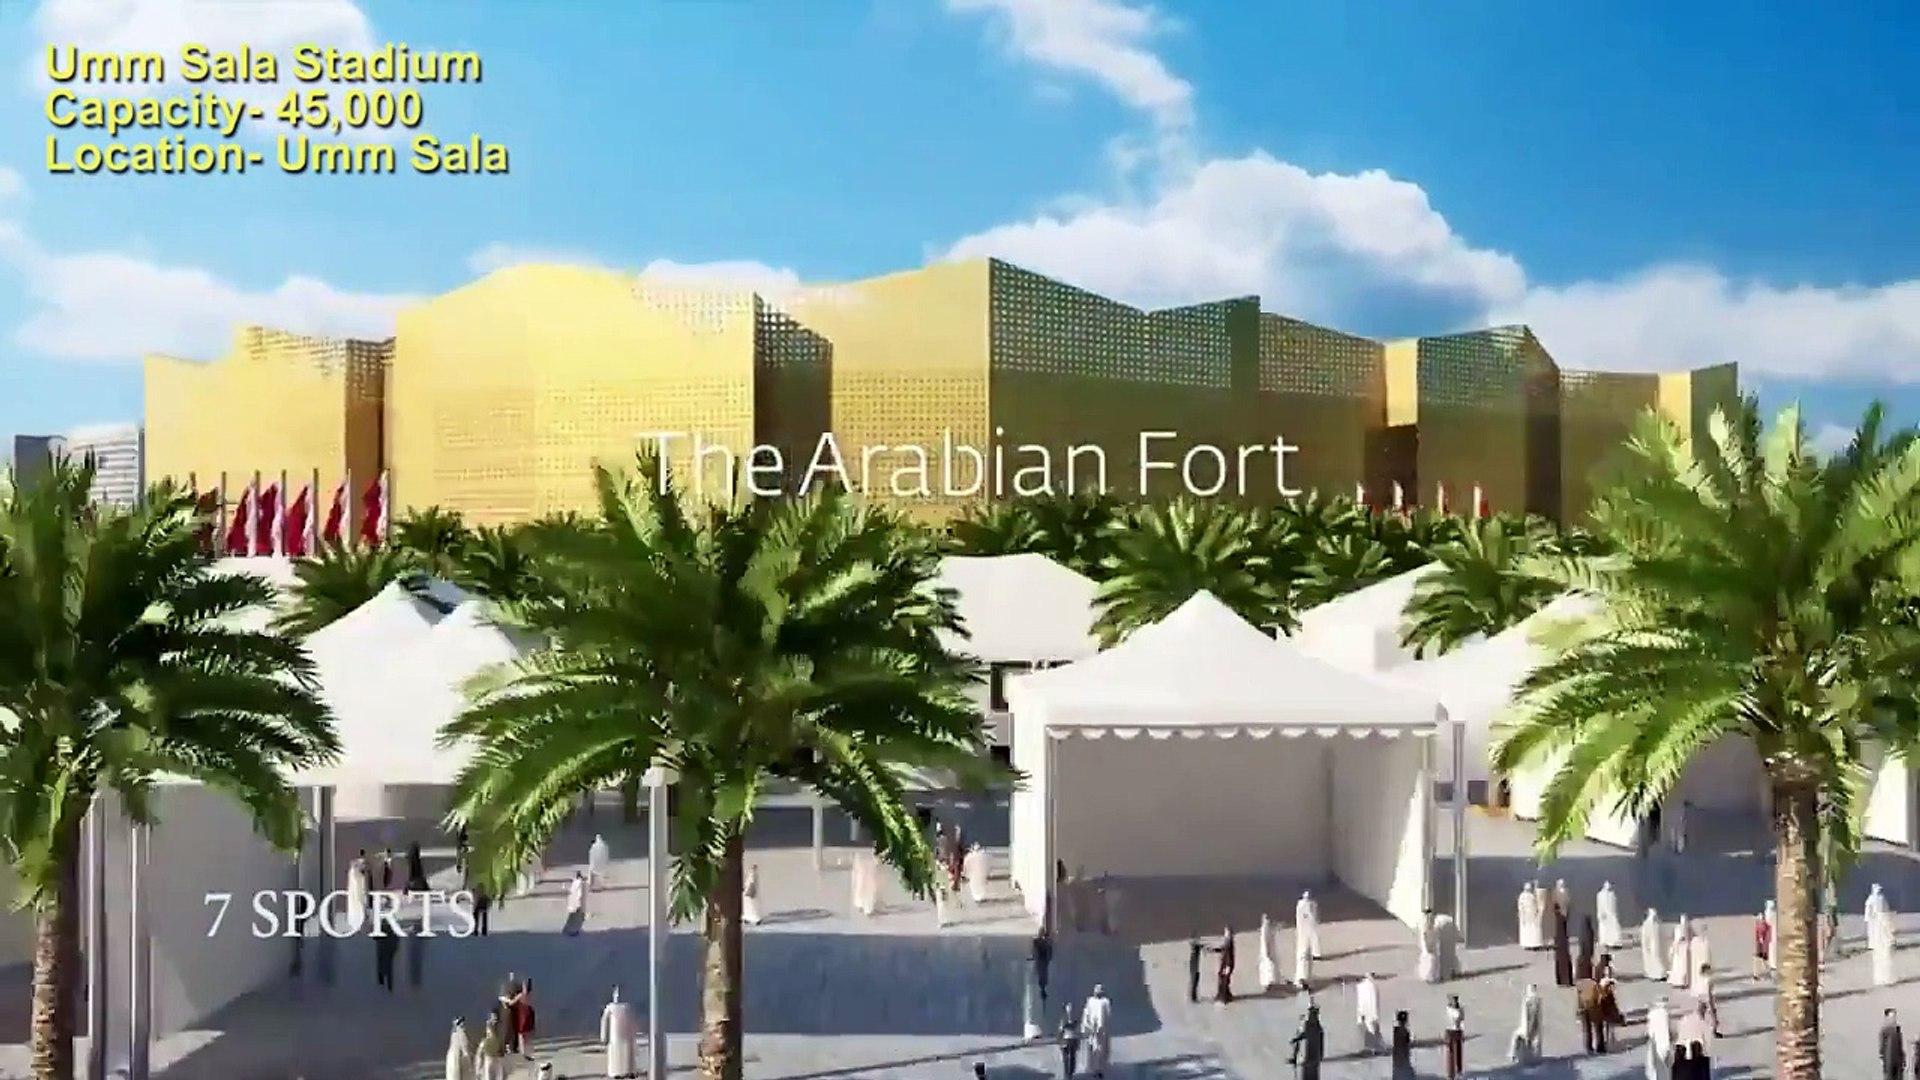 Umm Slal Stadium - Qatar World Cup 2022 Stadiums